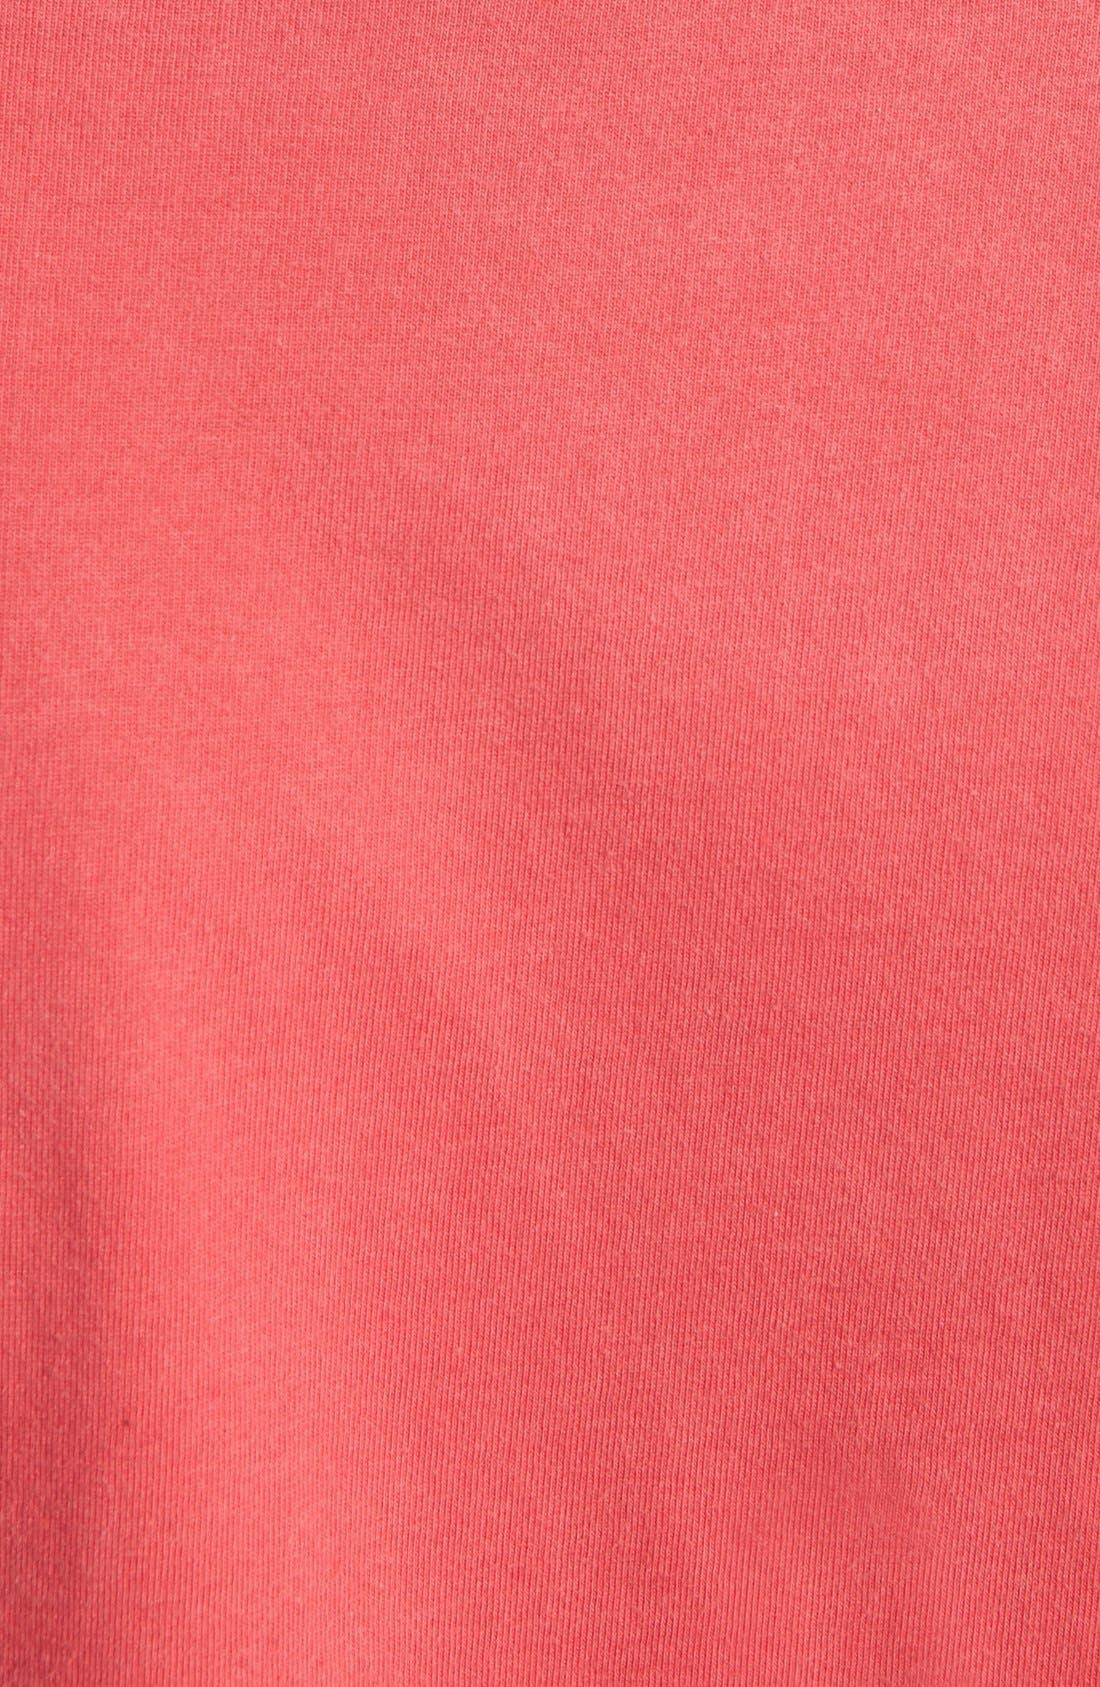 Alternate Image 3  - Red Jacket 'Reds - Reversal' T-Shirt